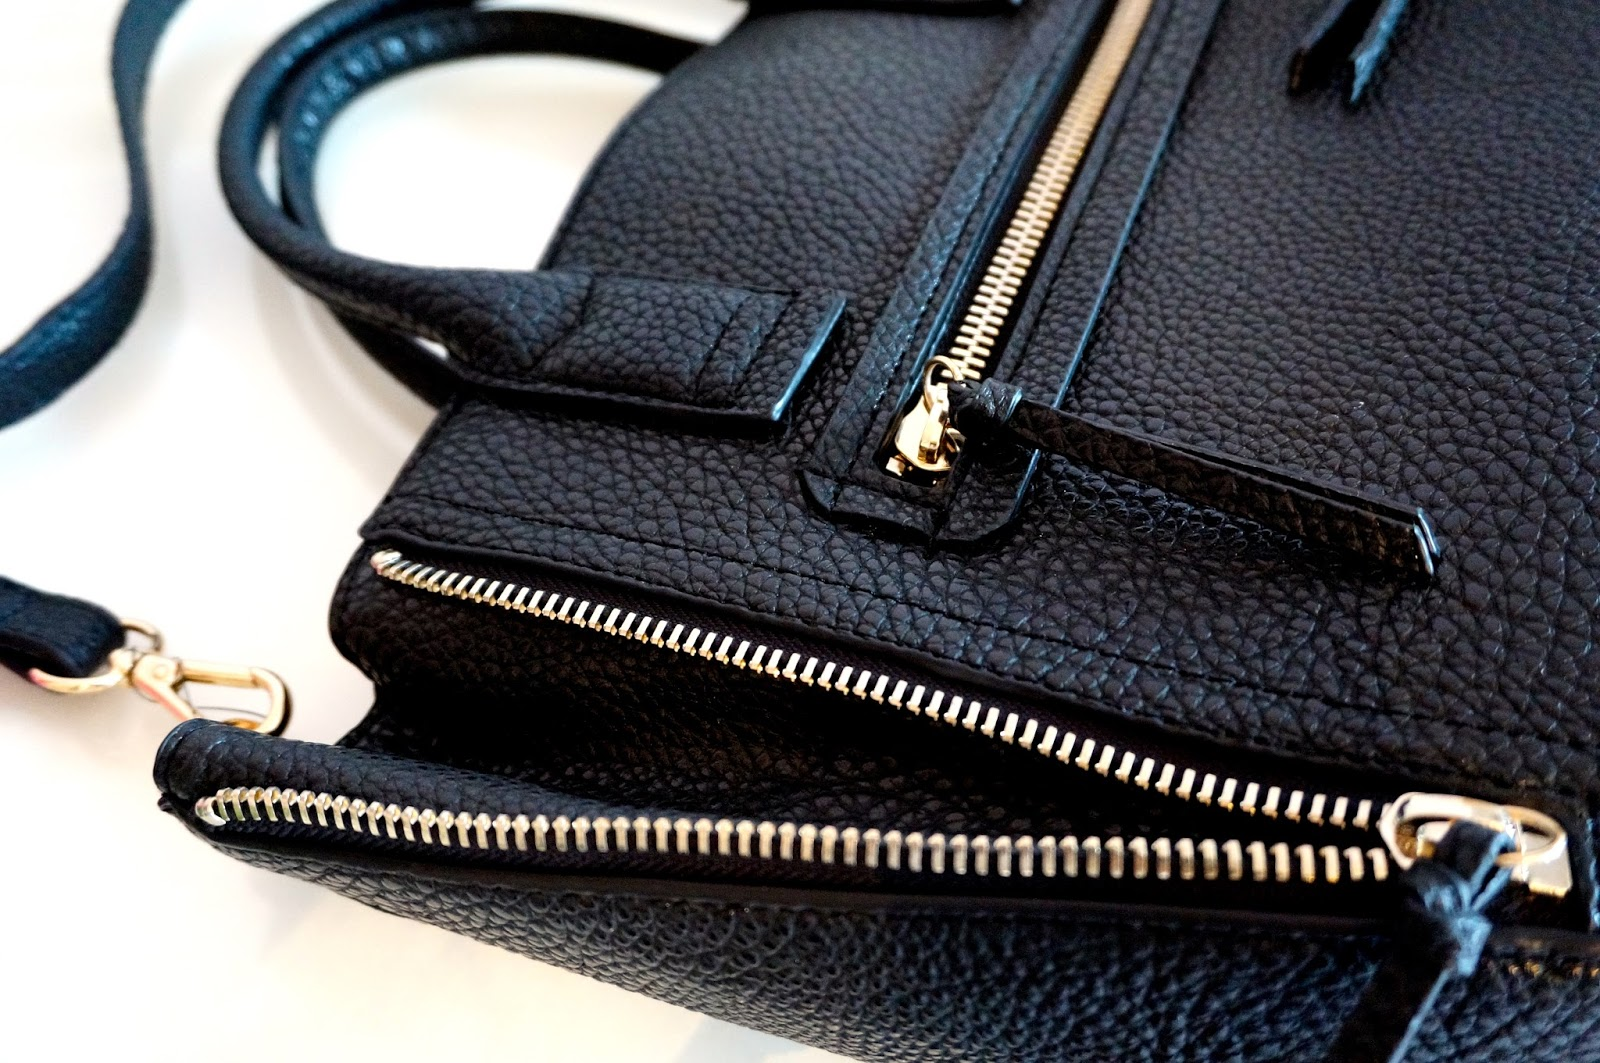 sac luggage celine - PHILIP LIM INSPIRED BUDGET BAG DUPE | Hanhabelle London Lifestyle Blog